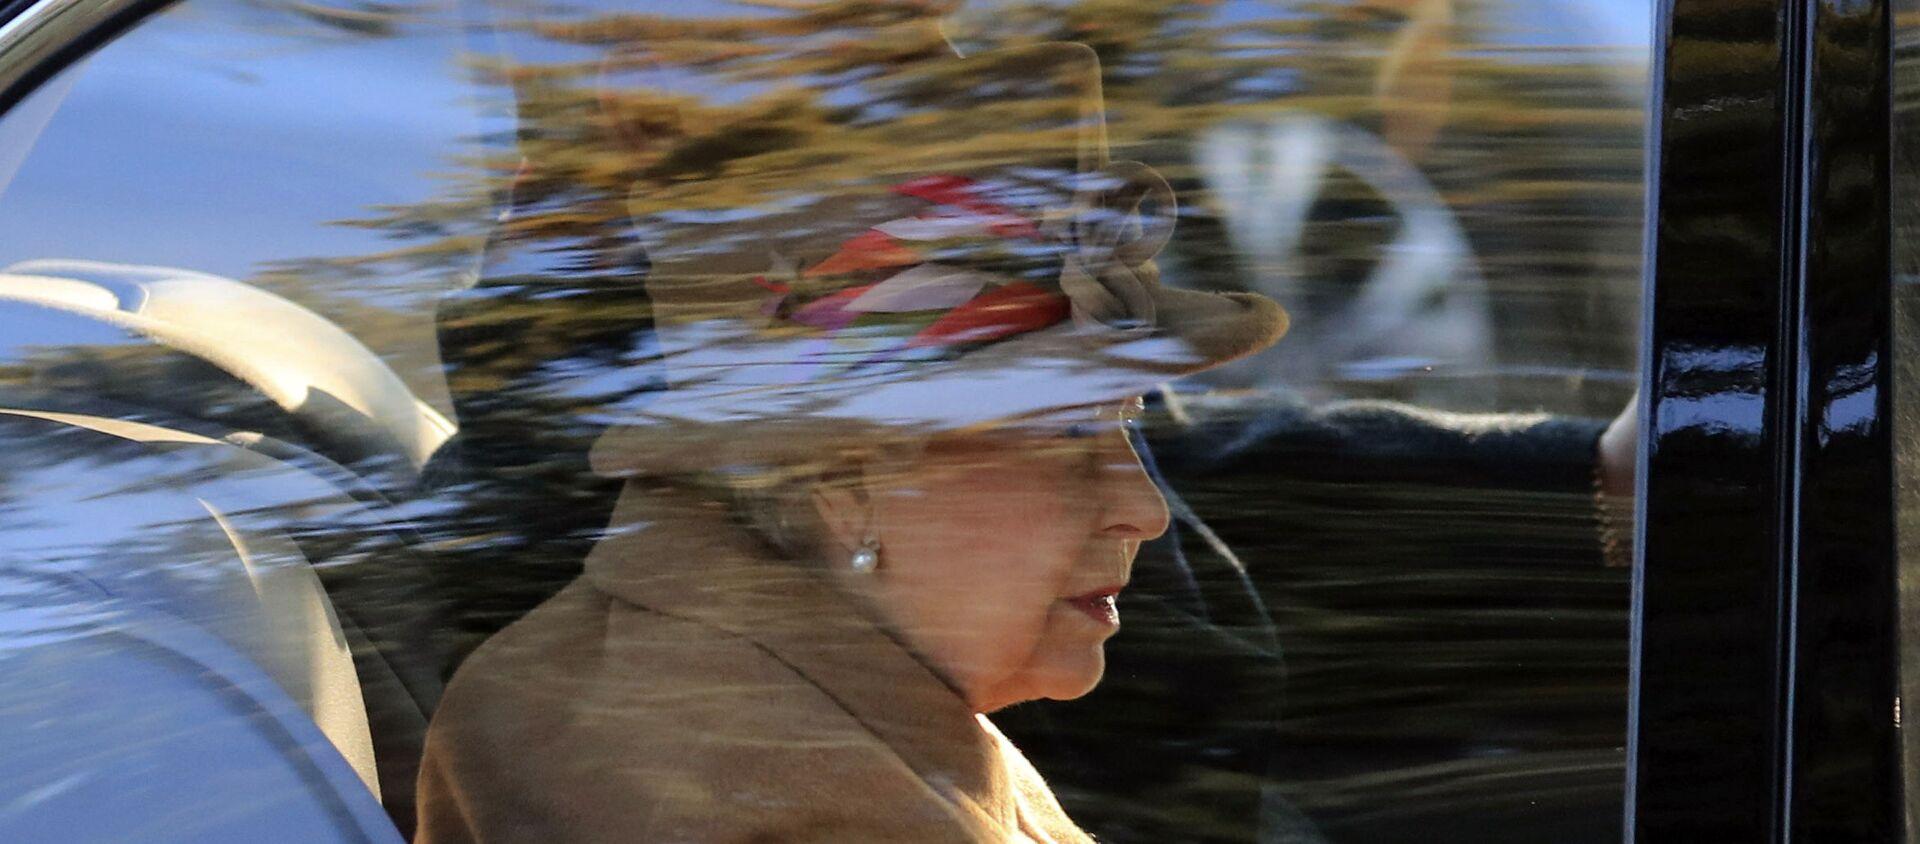 Britain's Queen Elizabeth attends a service at St Peter's church in Wolferton, near the Sandringham Estate in England, Sunday, Jan. 20, 2019. - Sputnik International, 1920, 16.04.2021